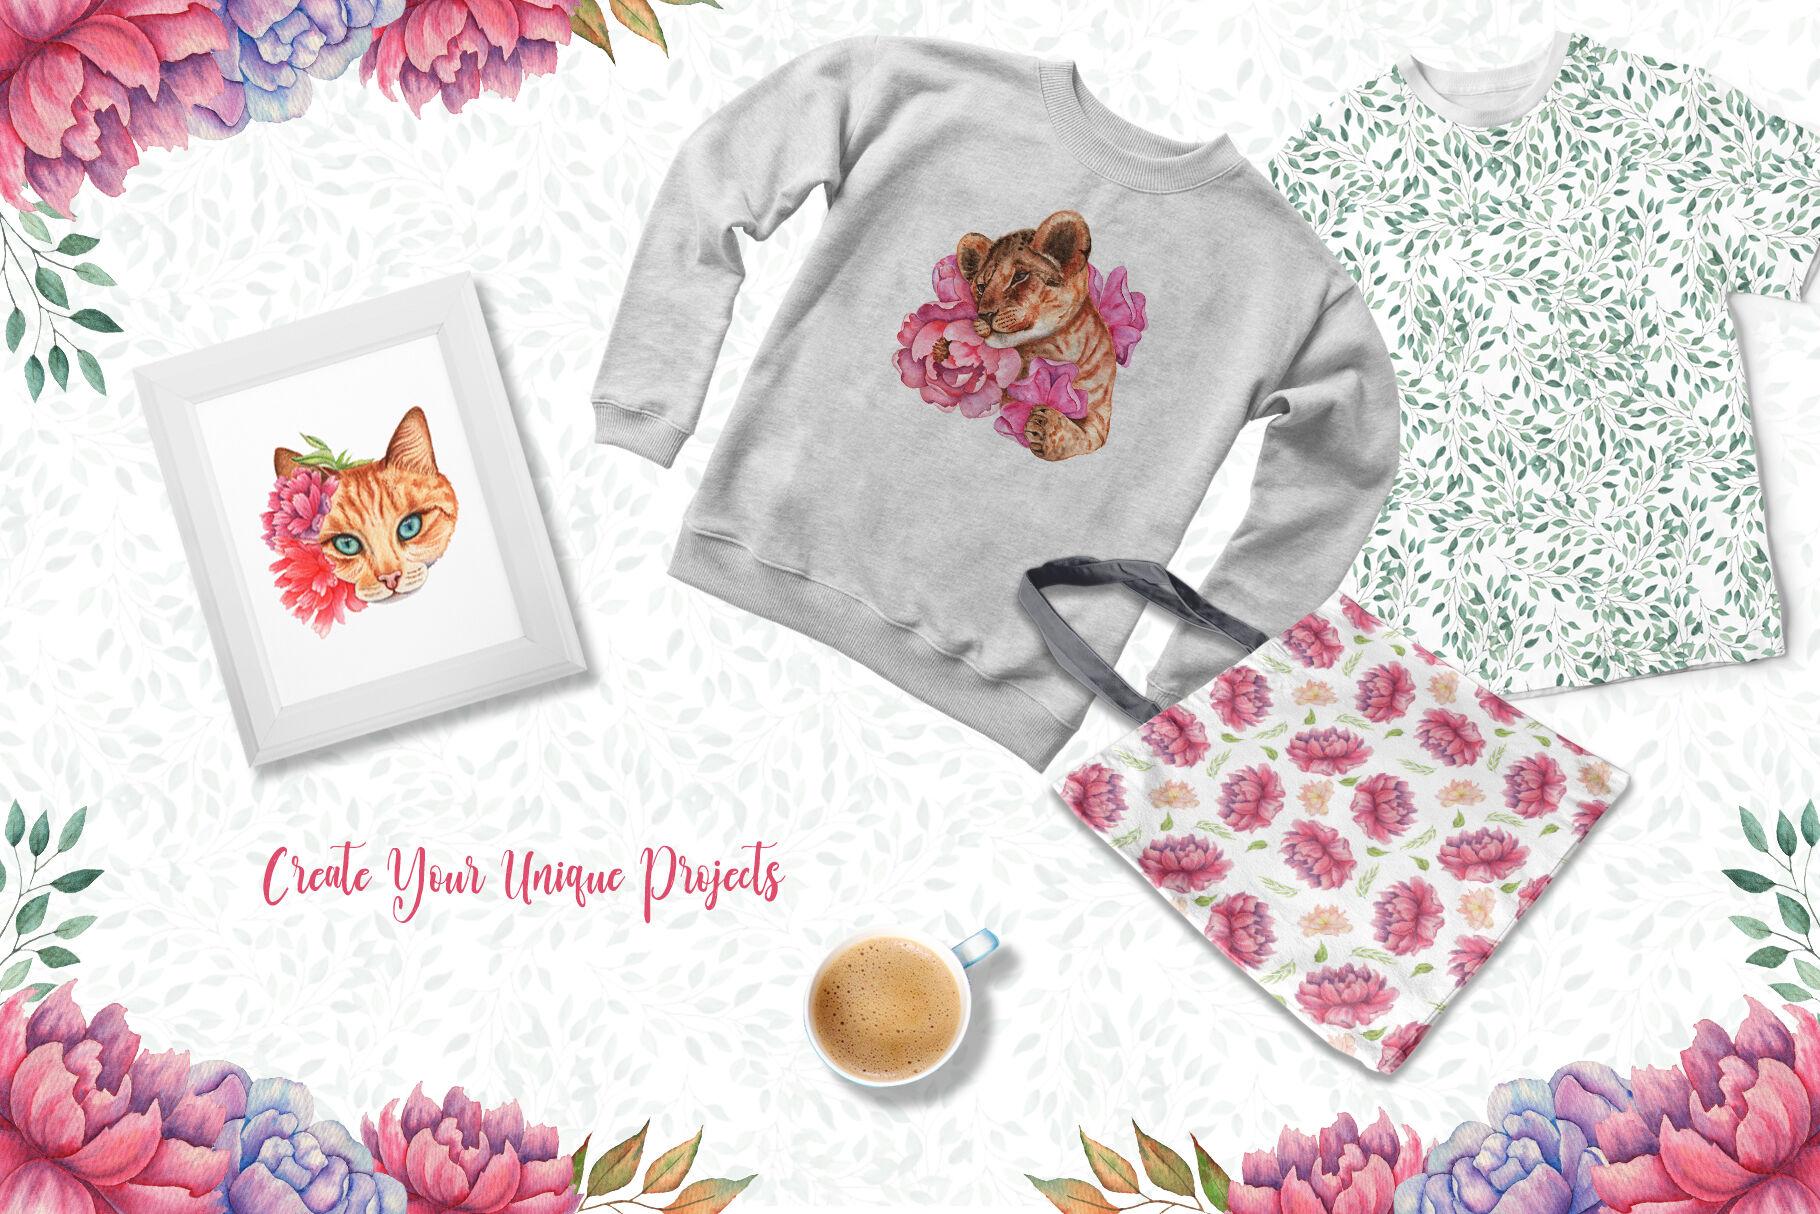 高清手绘花卉和动物水彩画图片集 Watercolor Flowers and Animals Set插图(6)